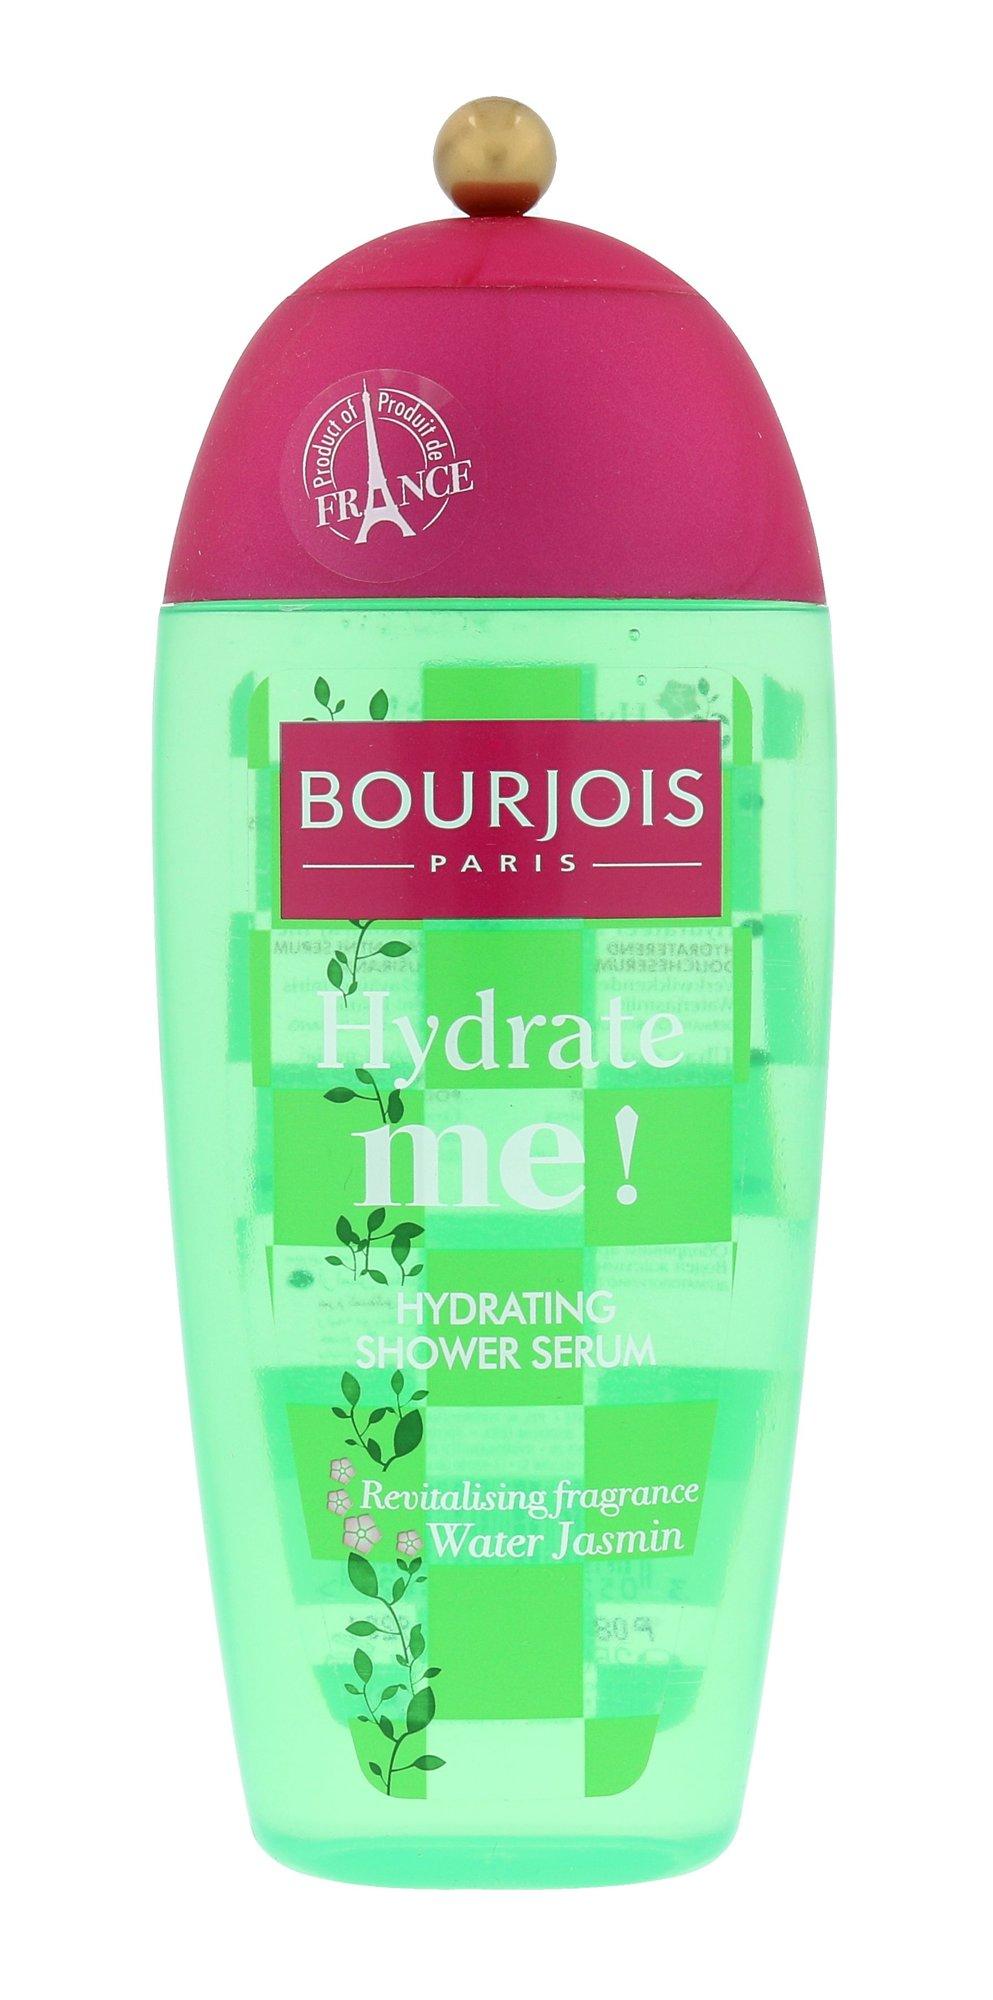 BOURJOIS Paris Hydrate Me Cosmetic 250ml